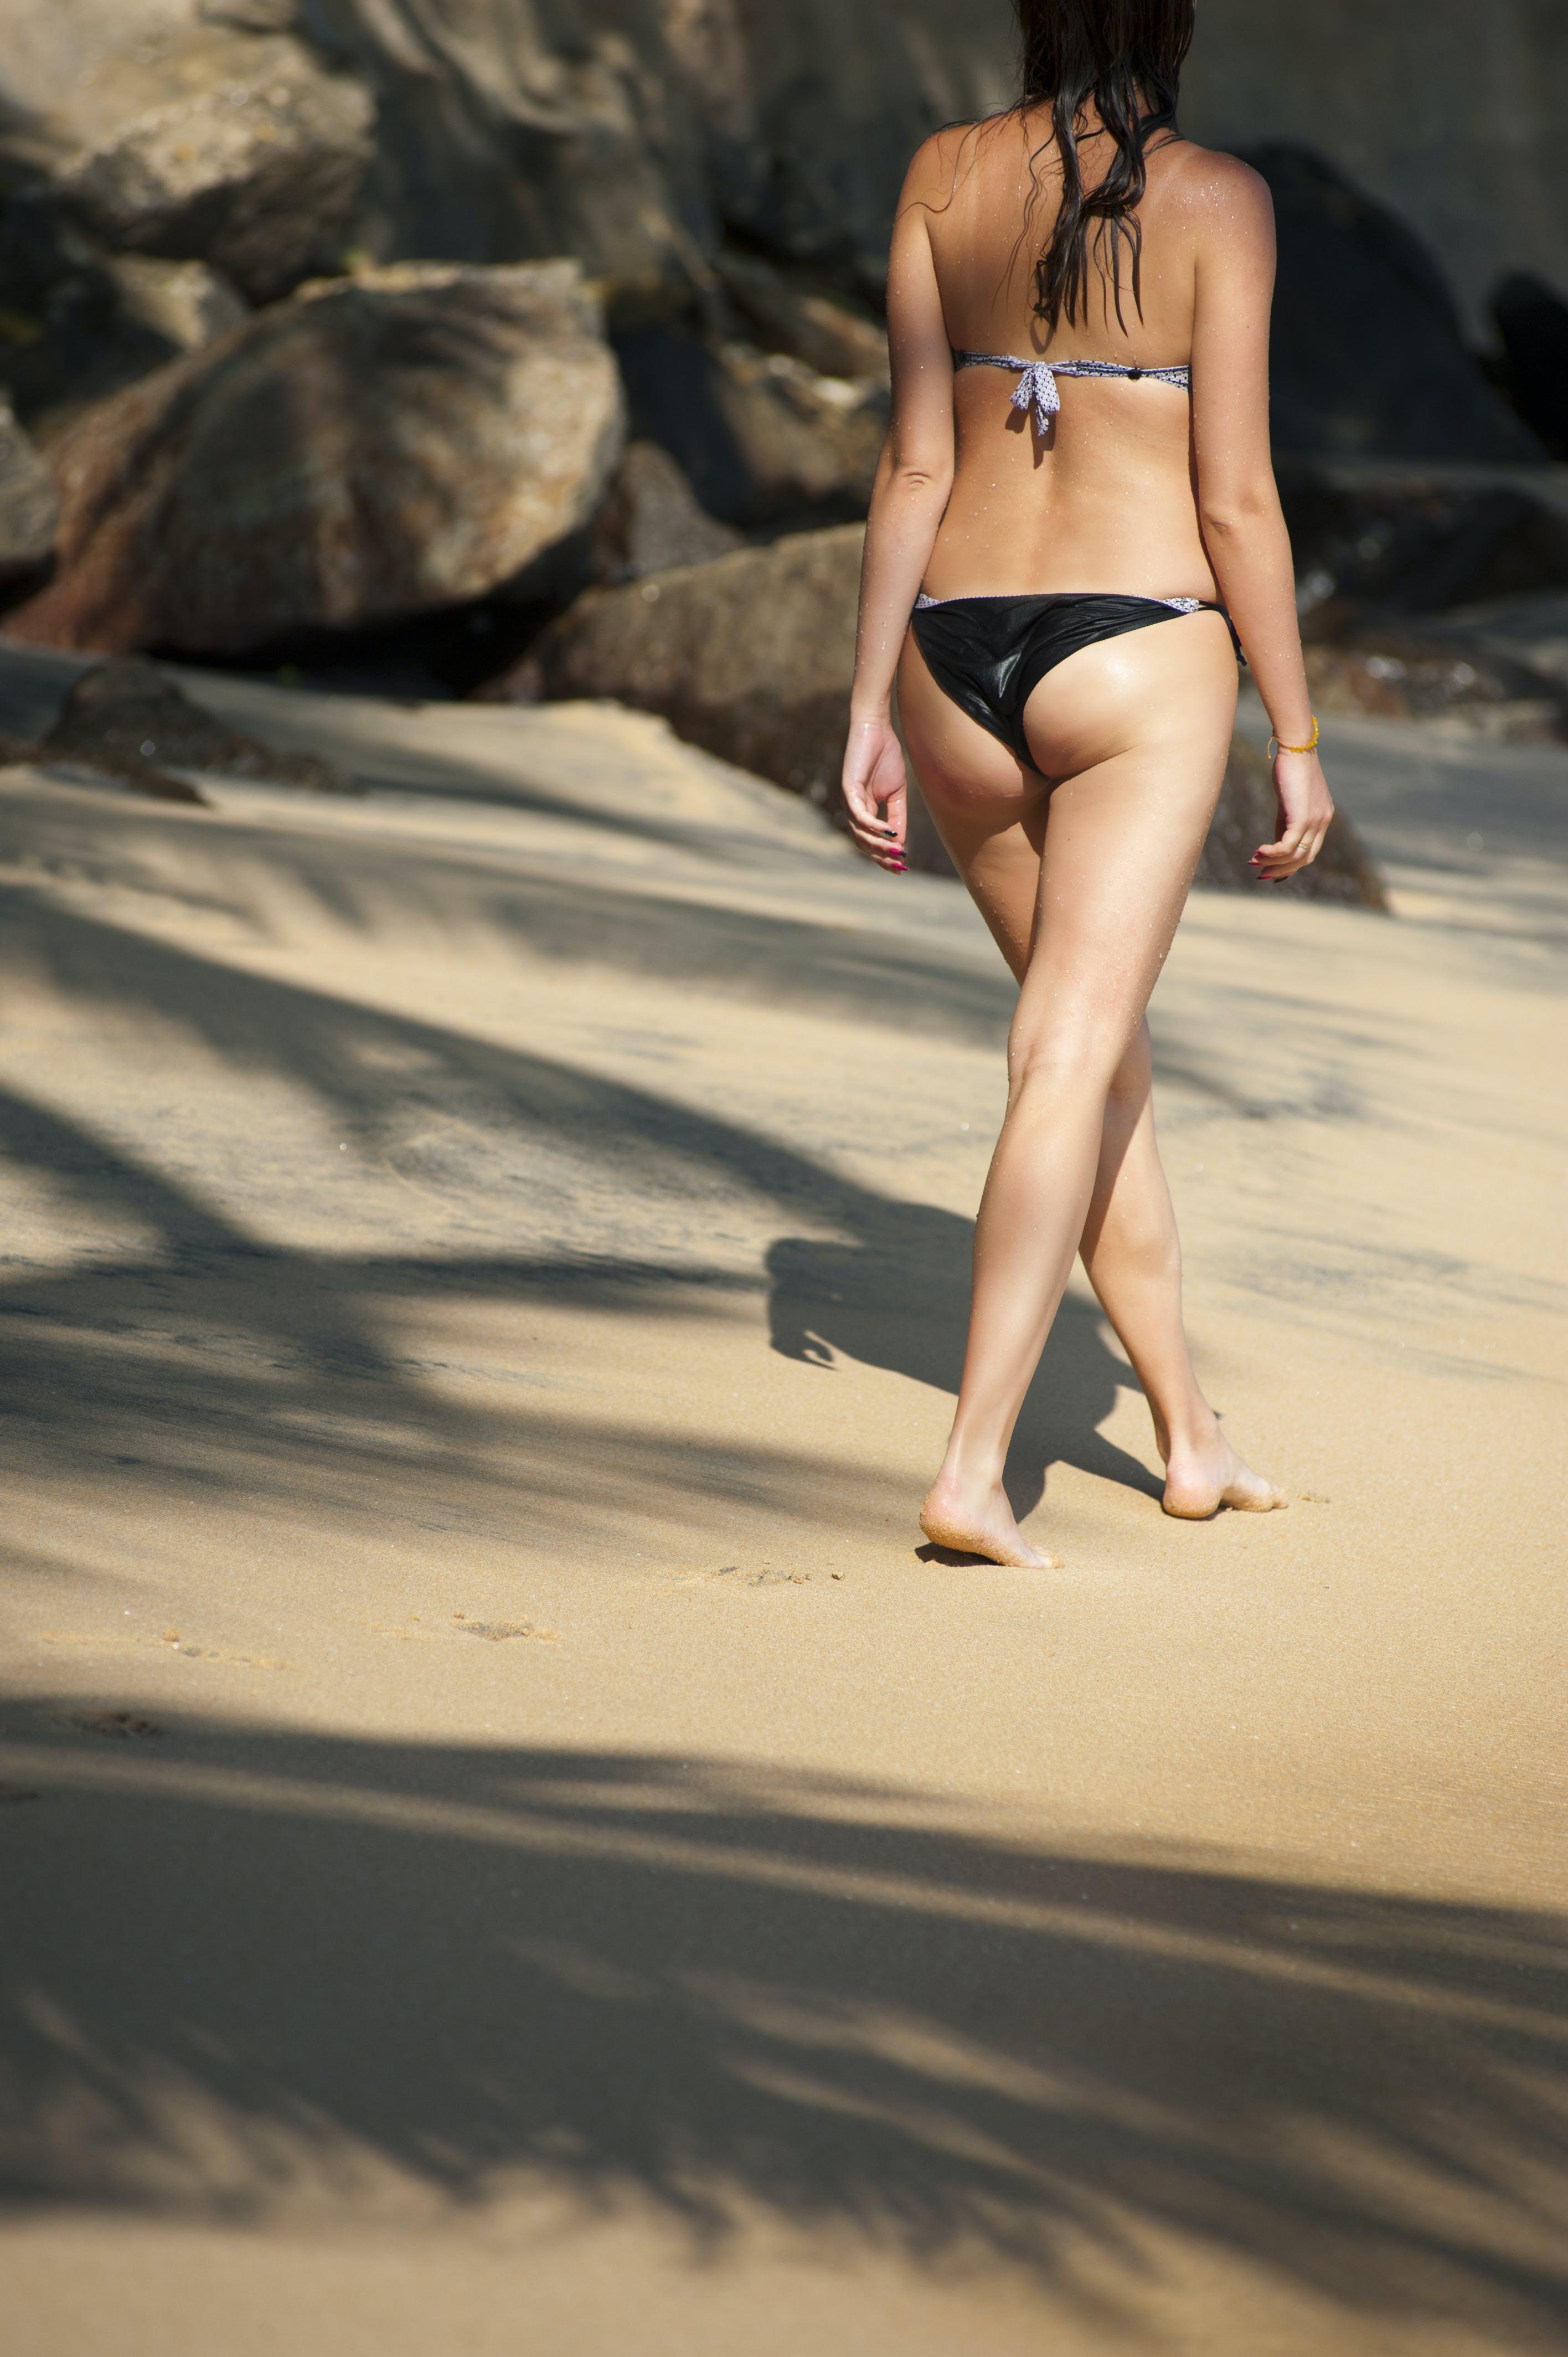 Fotos de stock gratuitas de arena, atractivo, bikini, chica